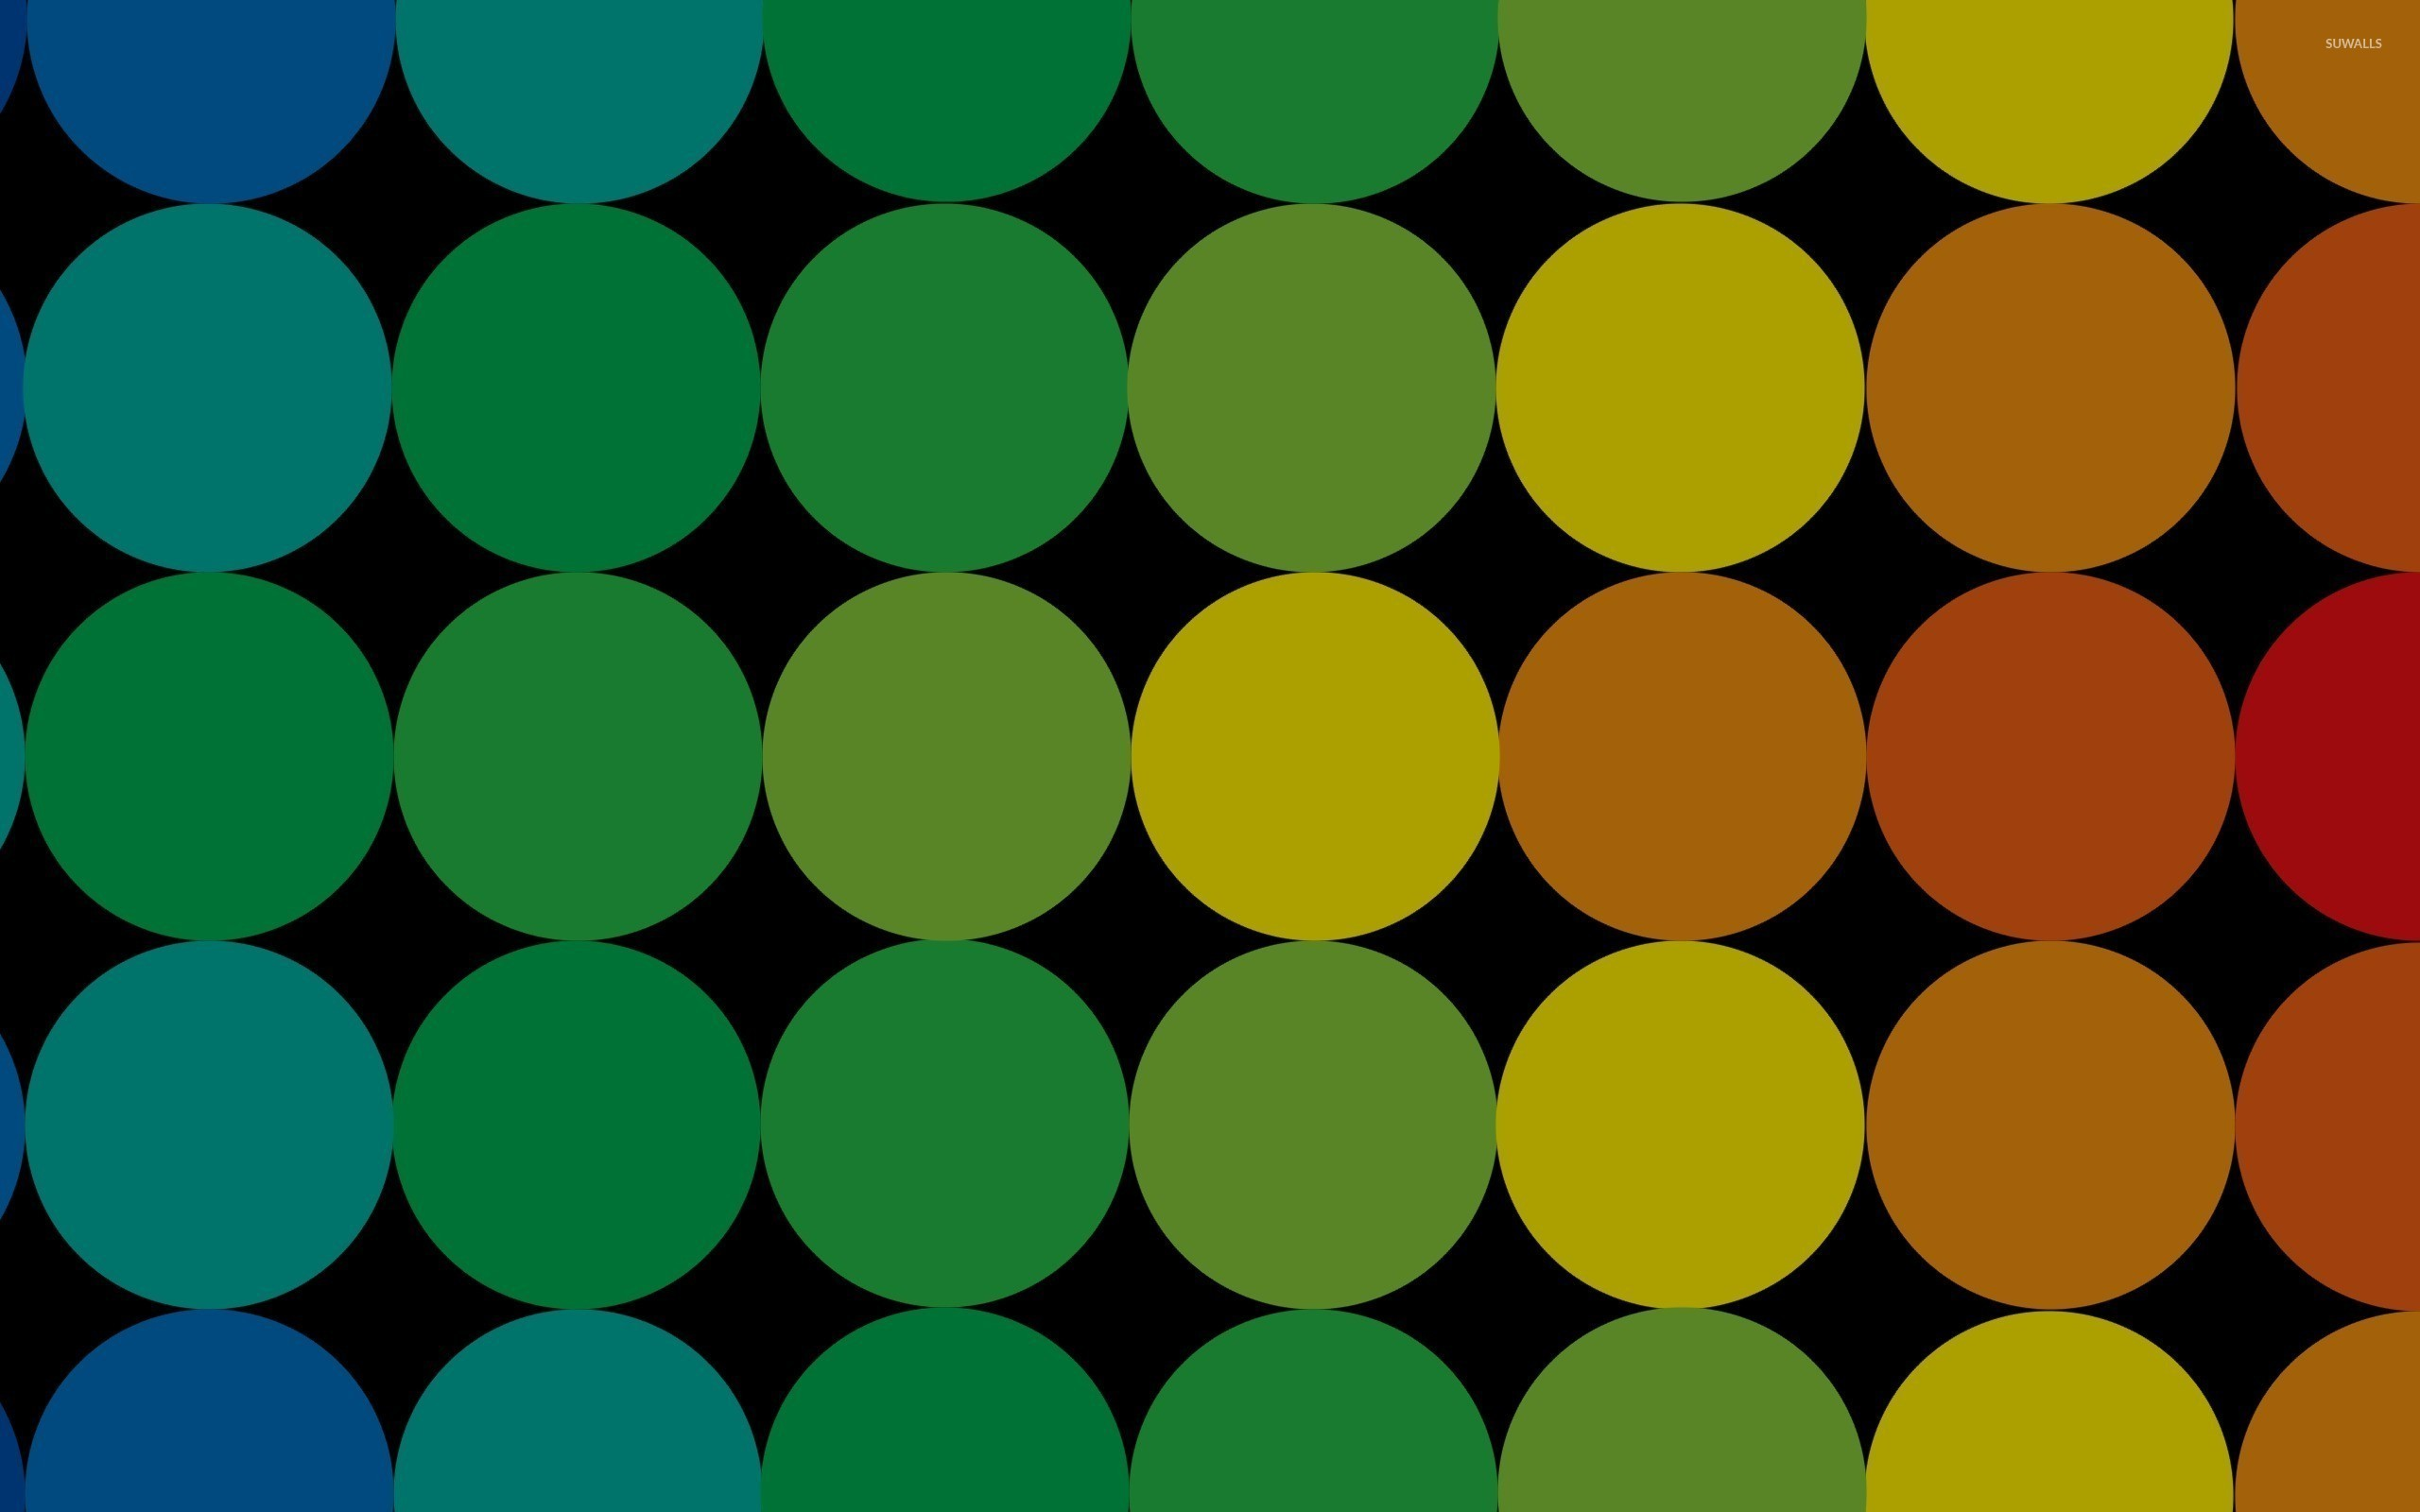 pastel circle pattern wallpaper abstract wallpapers 22477